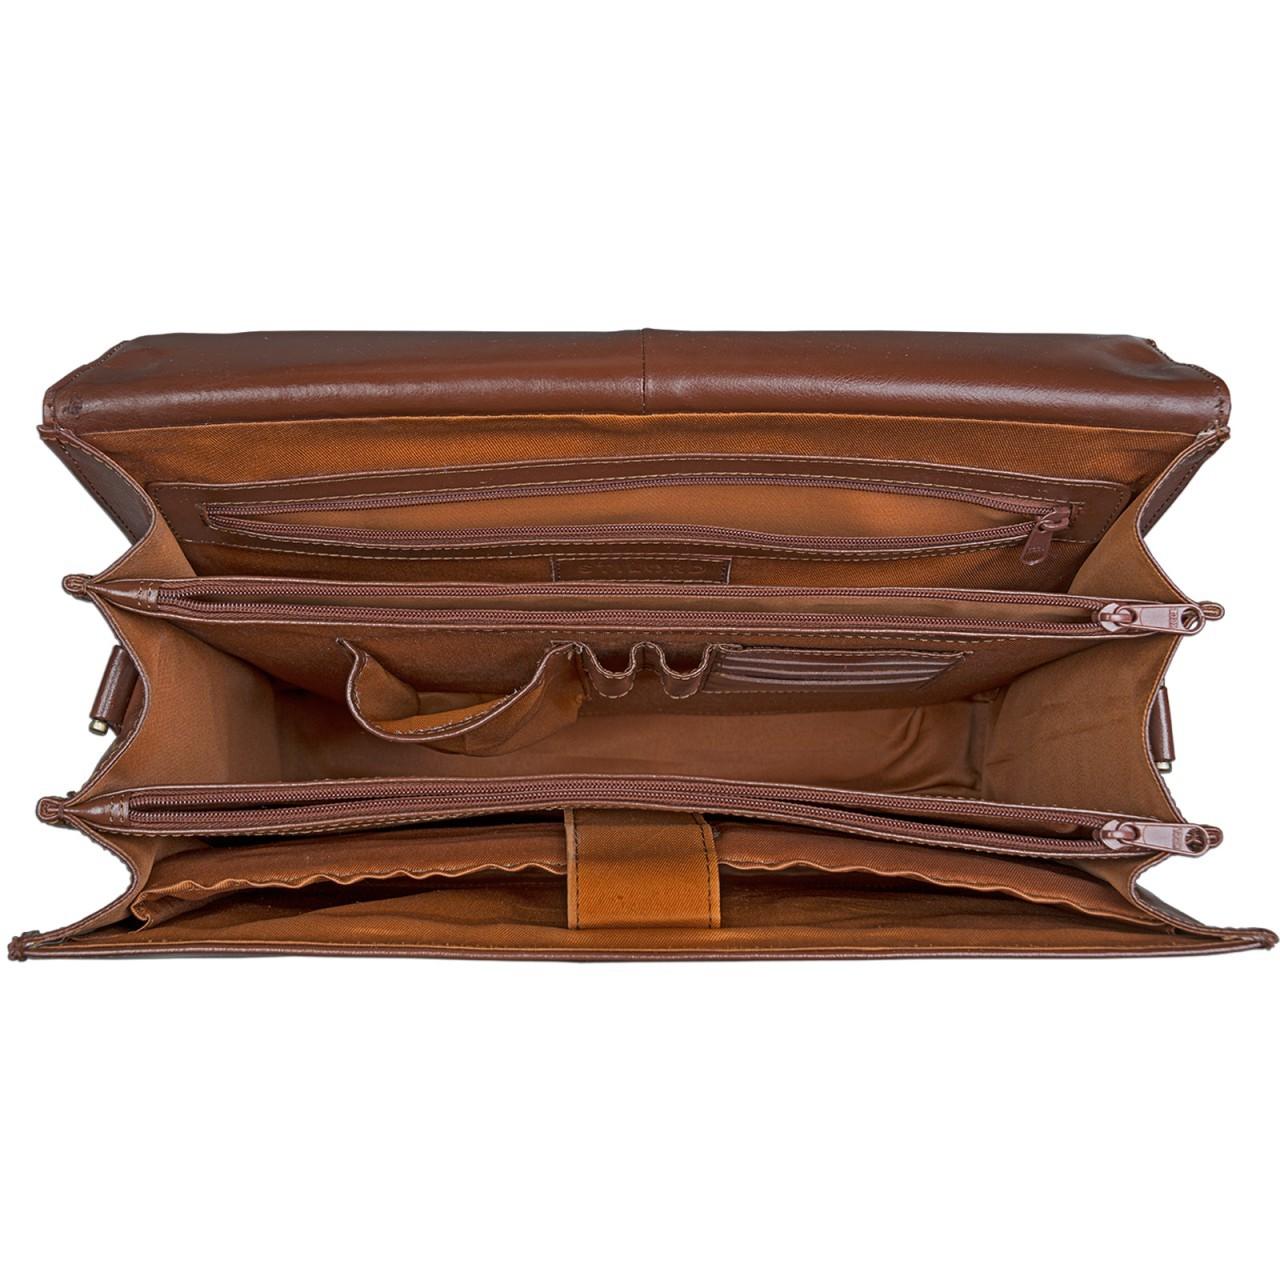 stilord aktentasche cognac braun herren damen b rotasche business tasche laptopfach 15 6 zoll. Black Bedroom Furniture Sets. Home Design Ideas